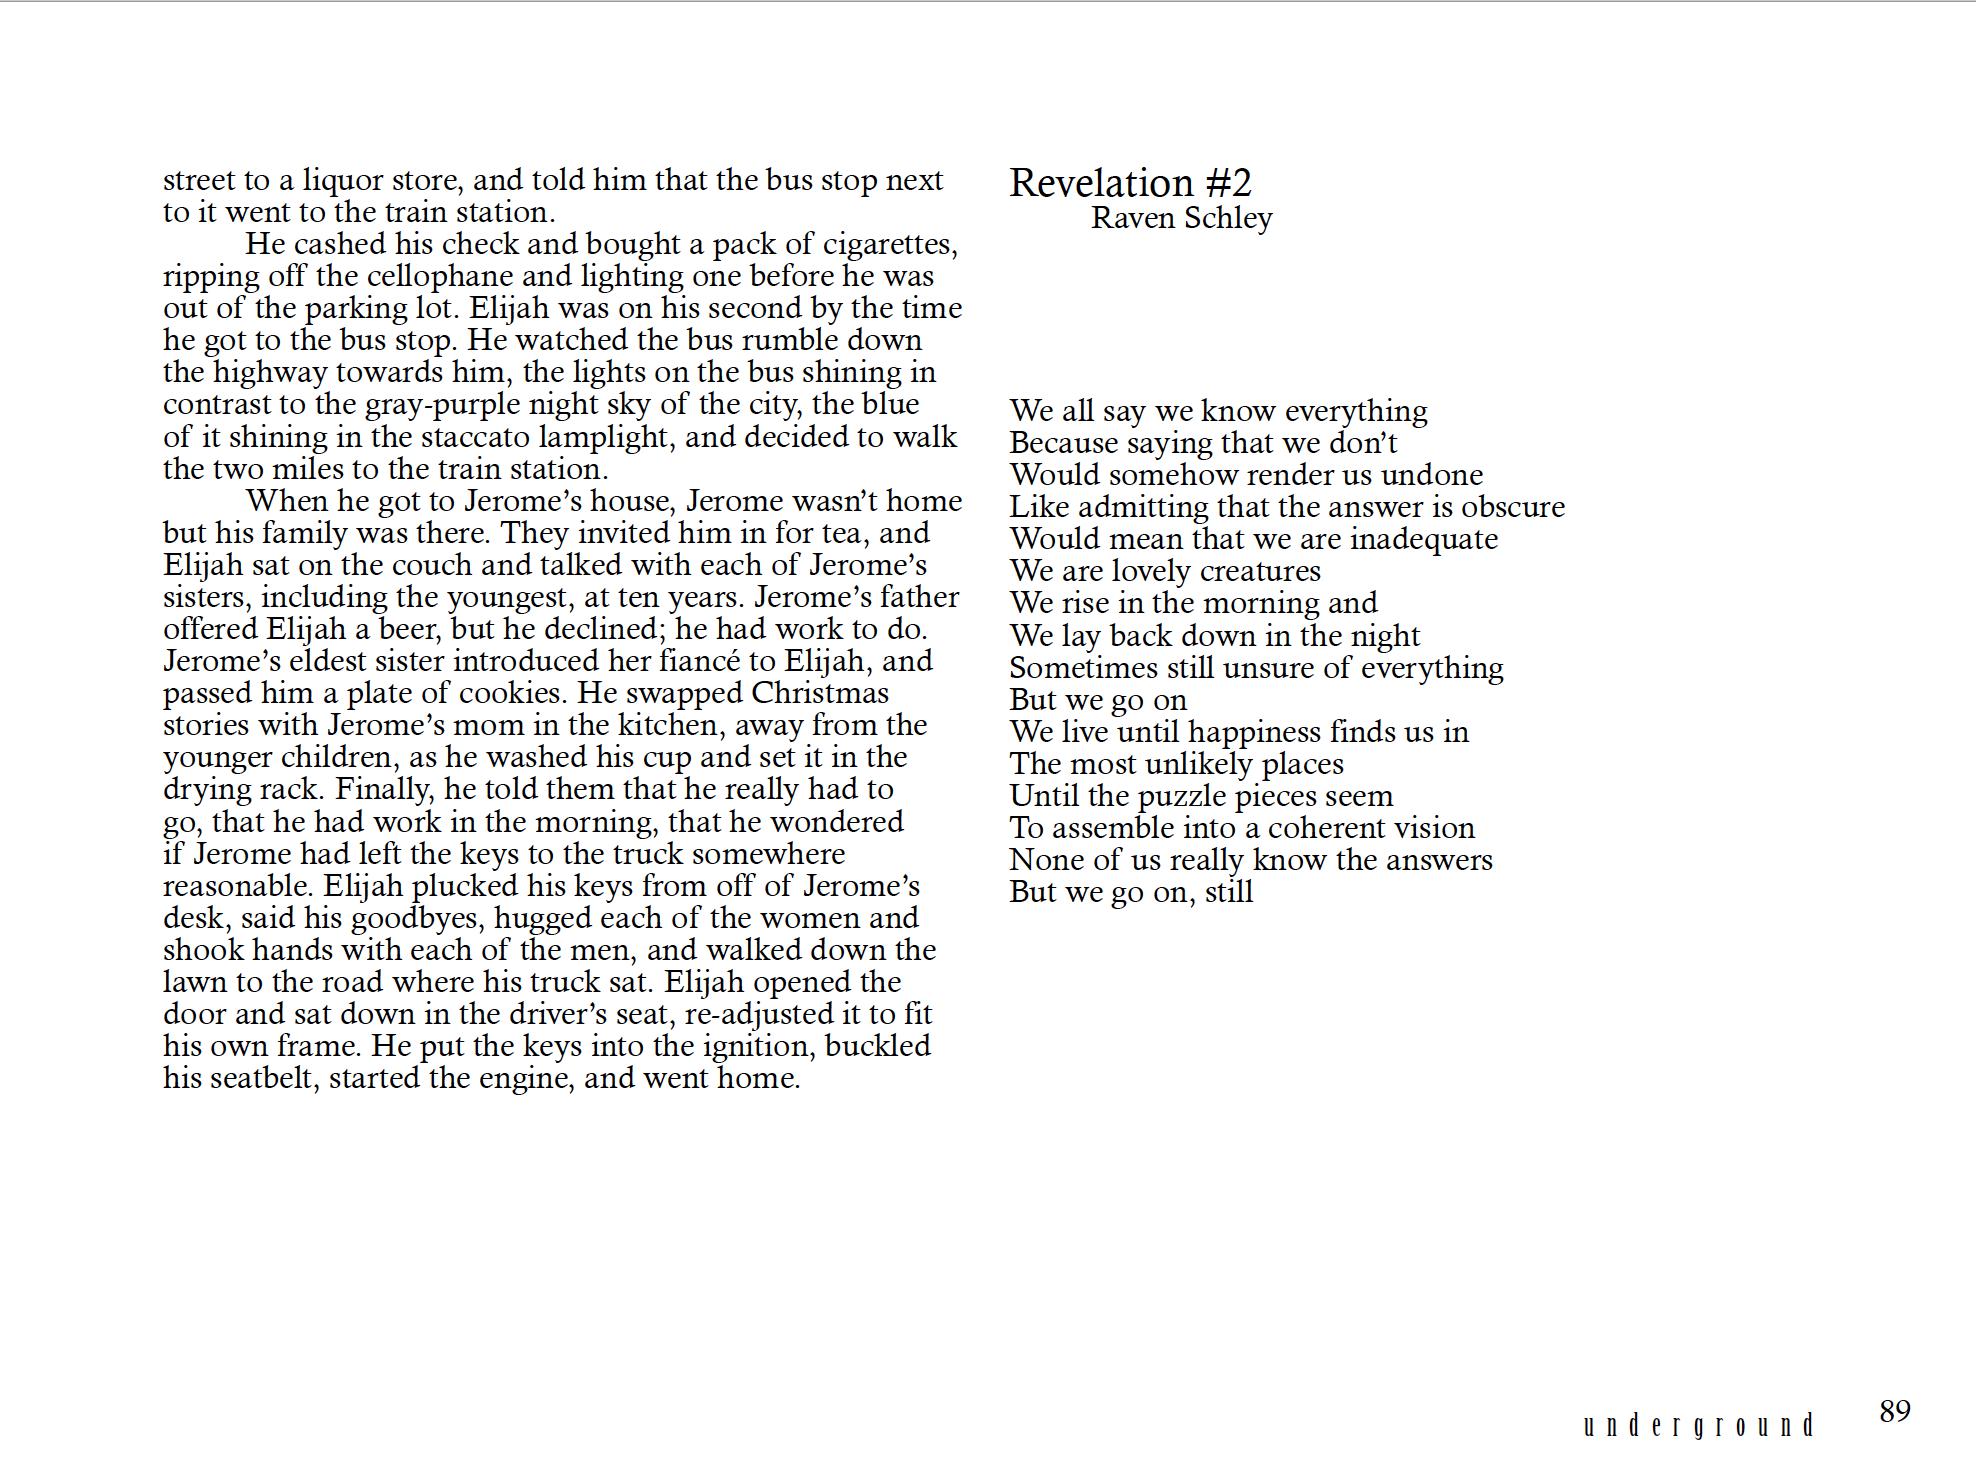 Underground_Revelation #2_Poem.png